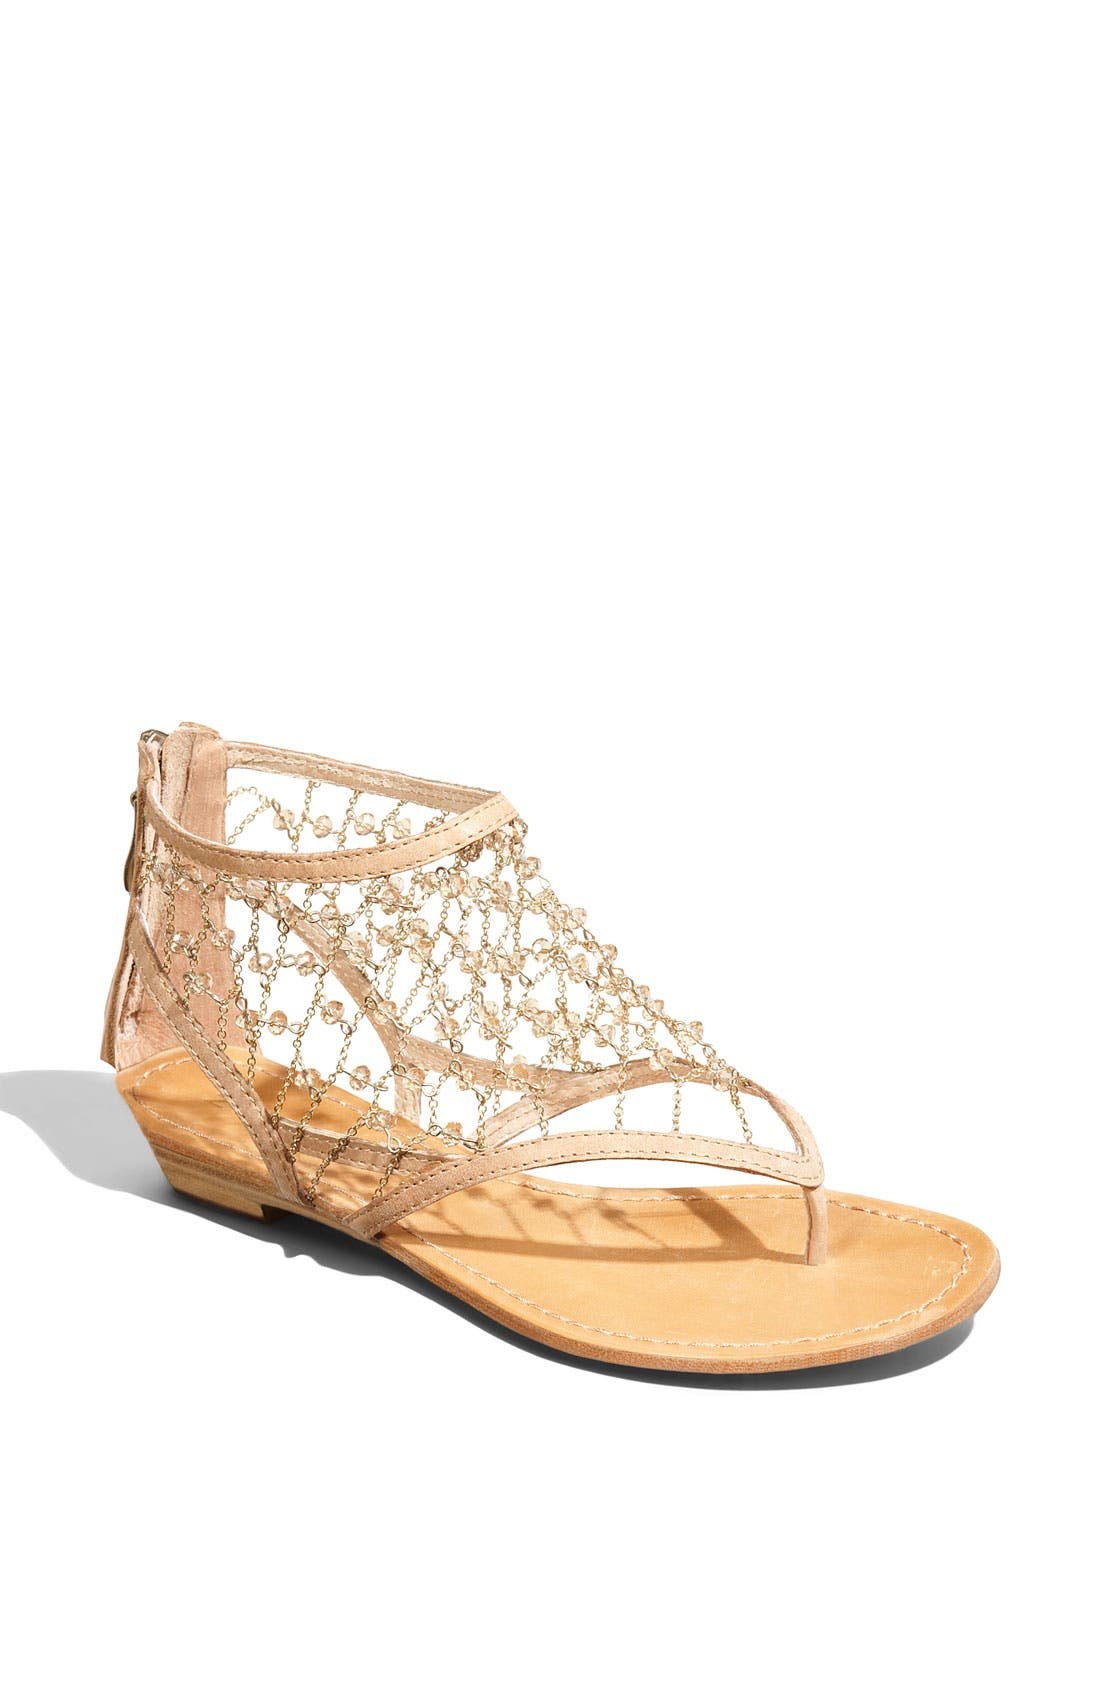 Main Image - ZiGi girl 'Klive' Sandal